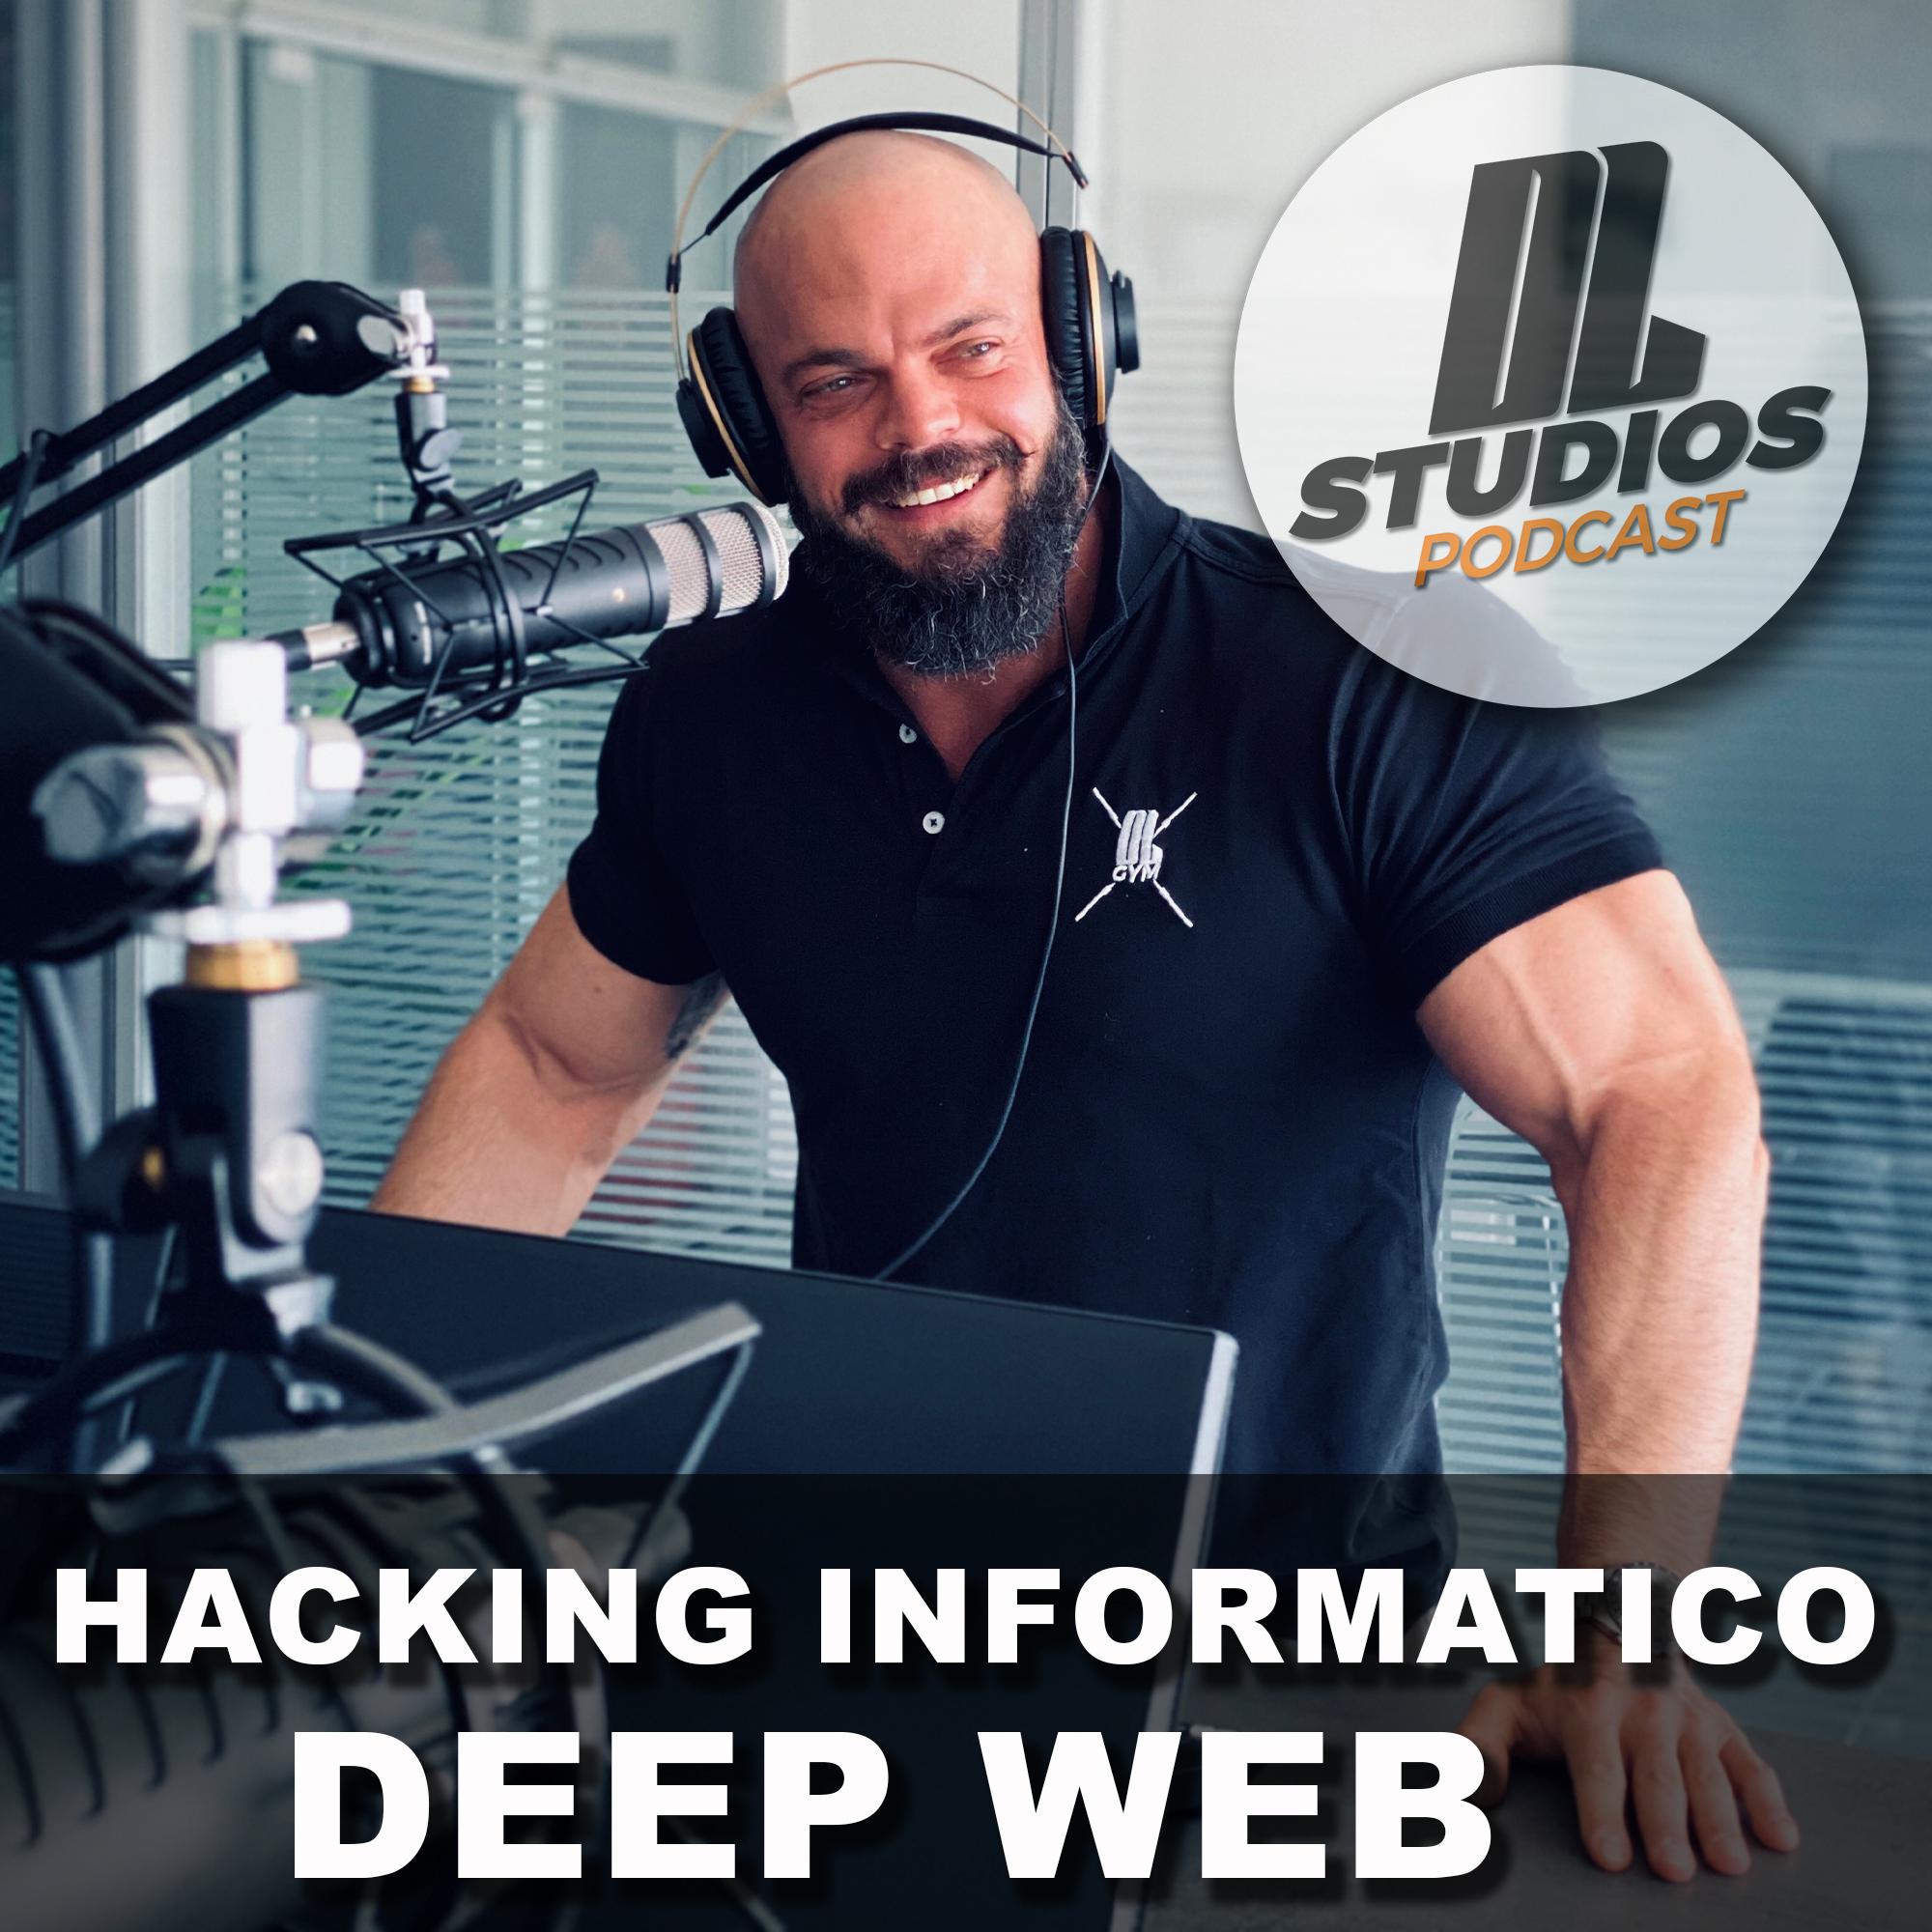 Deep web e hacking informatico